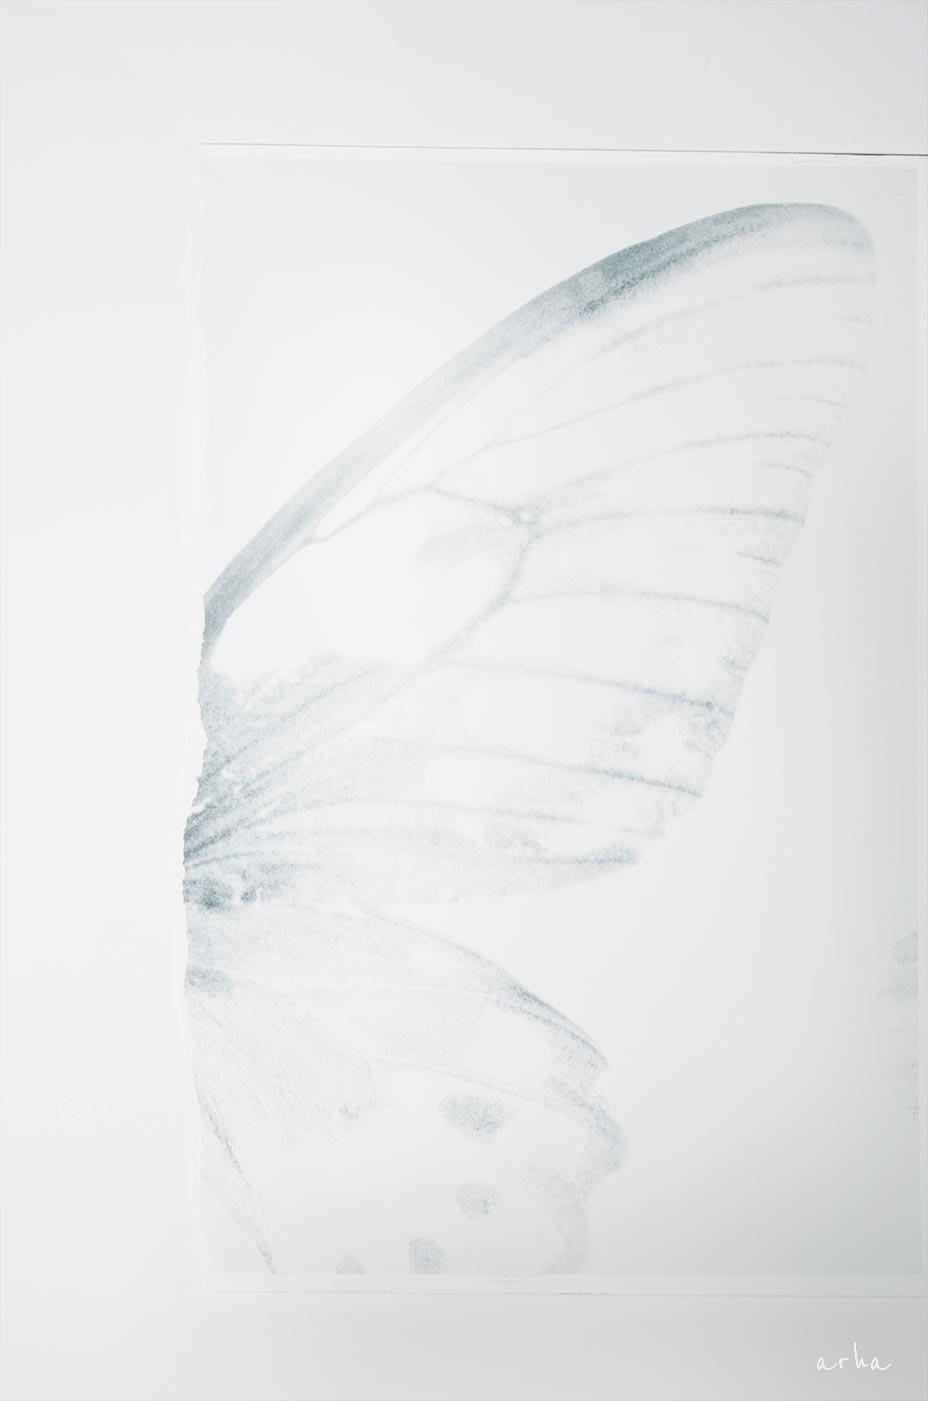 papion-copyright-2012-arha-Tomomichi-Morifuji